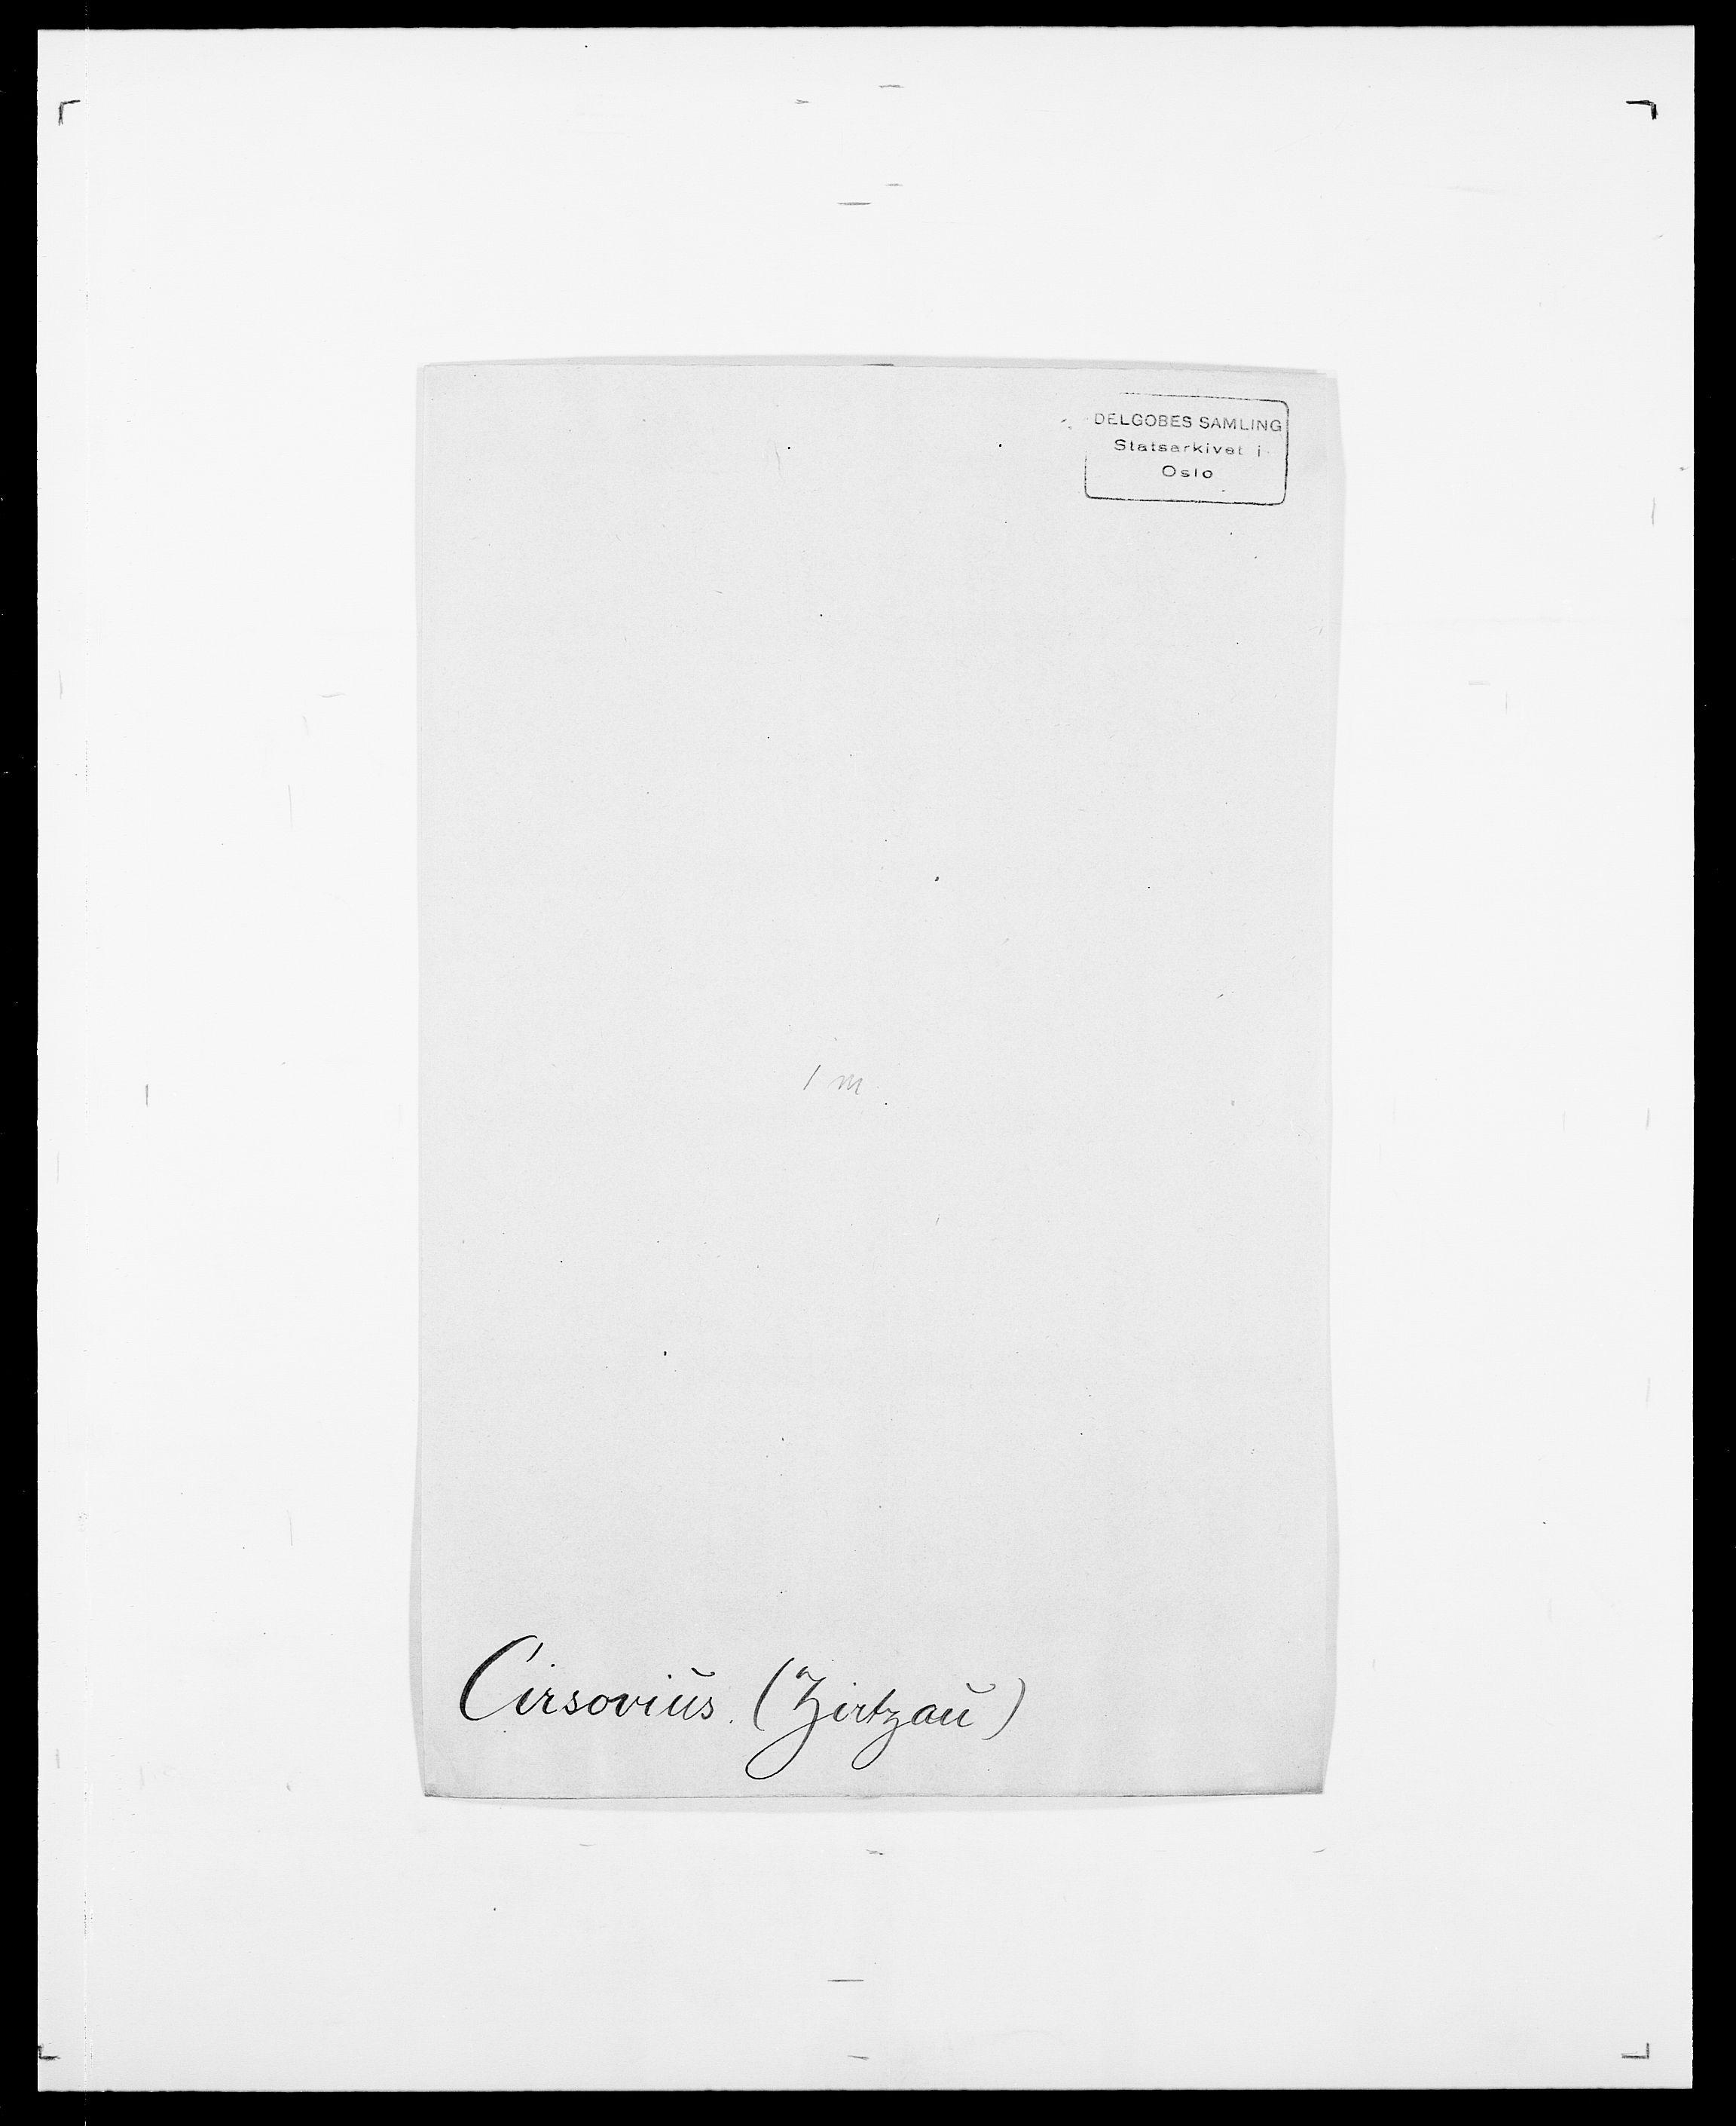 SAO, Delgobe, Charles Antoine - samling, D/Da/L0008: Capjon - Dagenbolt, s. 304